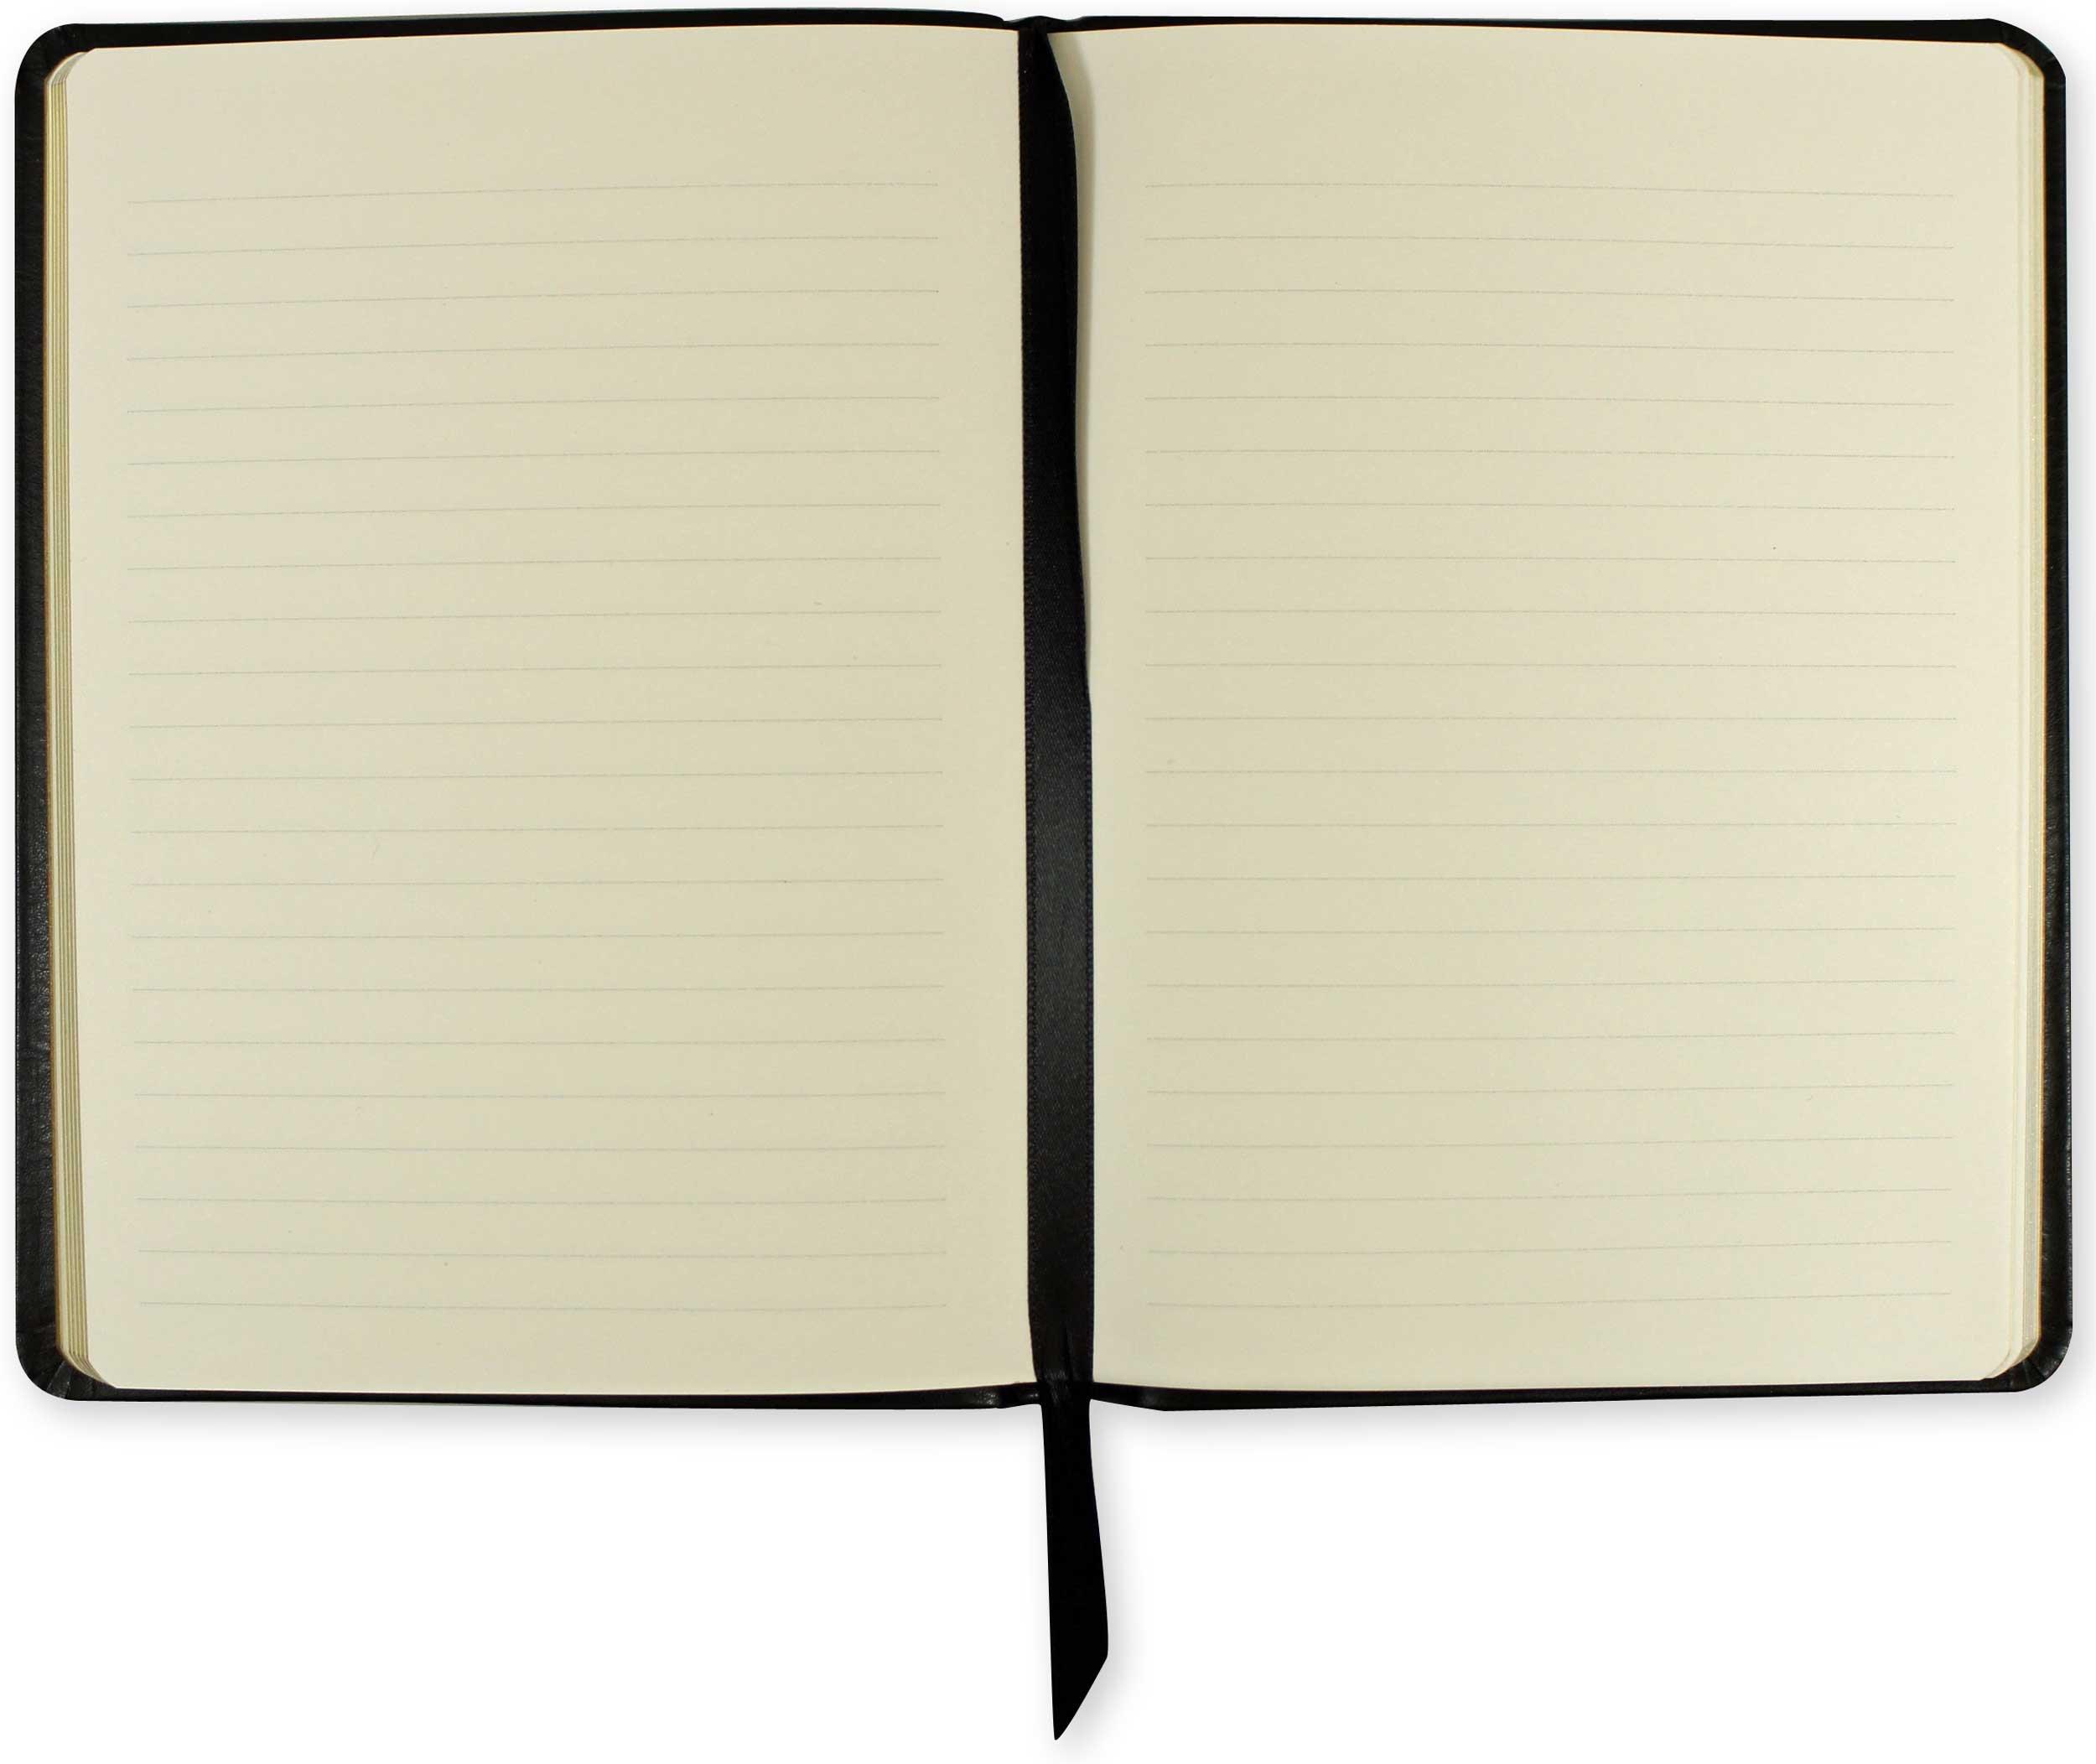 Image result for journal;